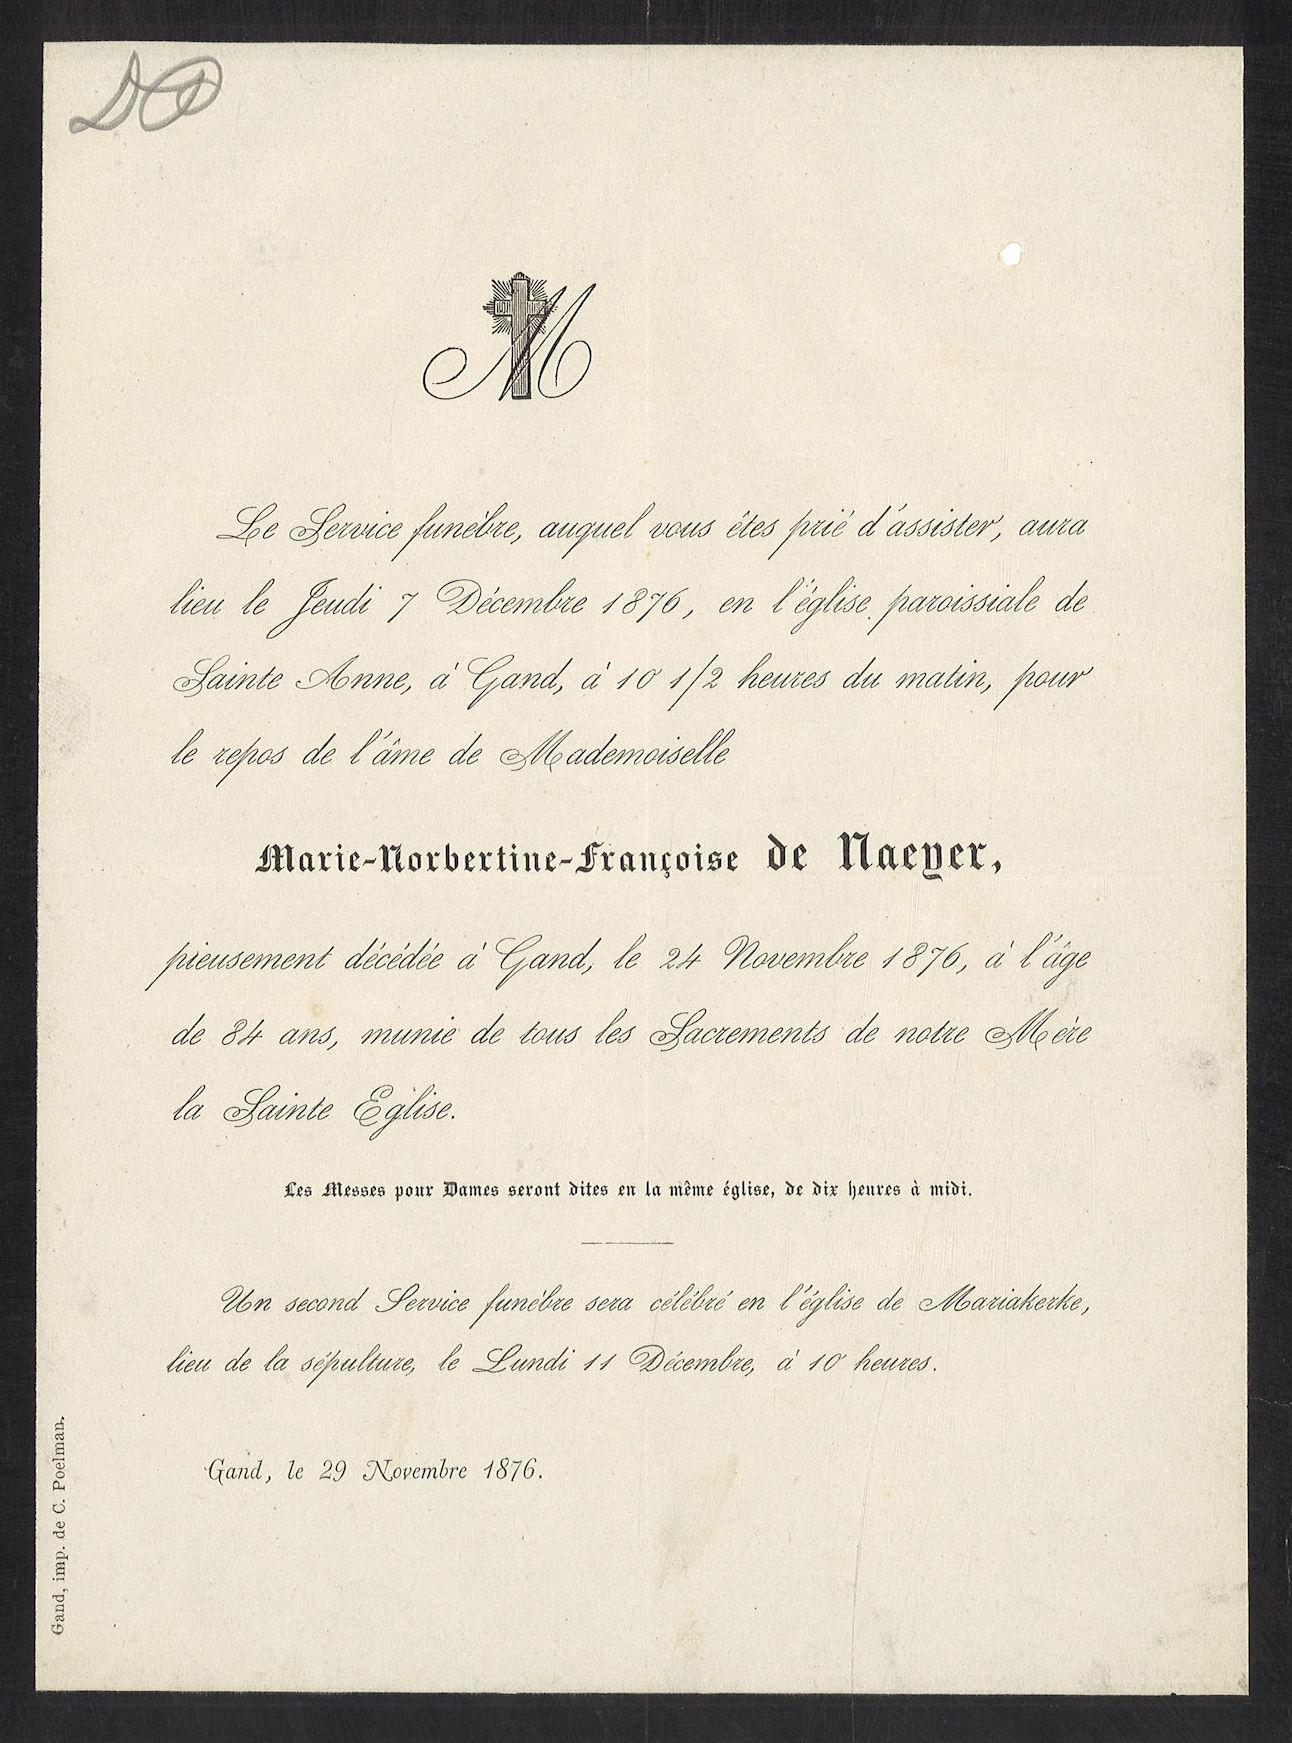 Marie-Norbertine-Françoise de Nayer